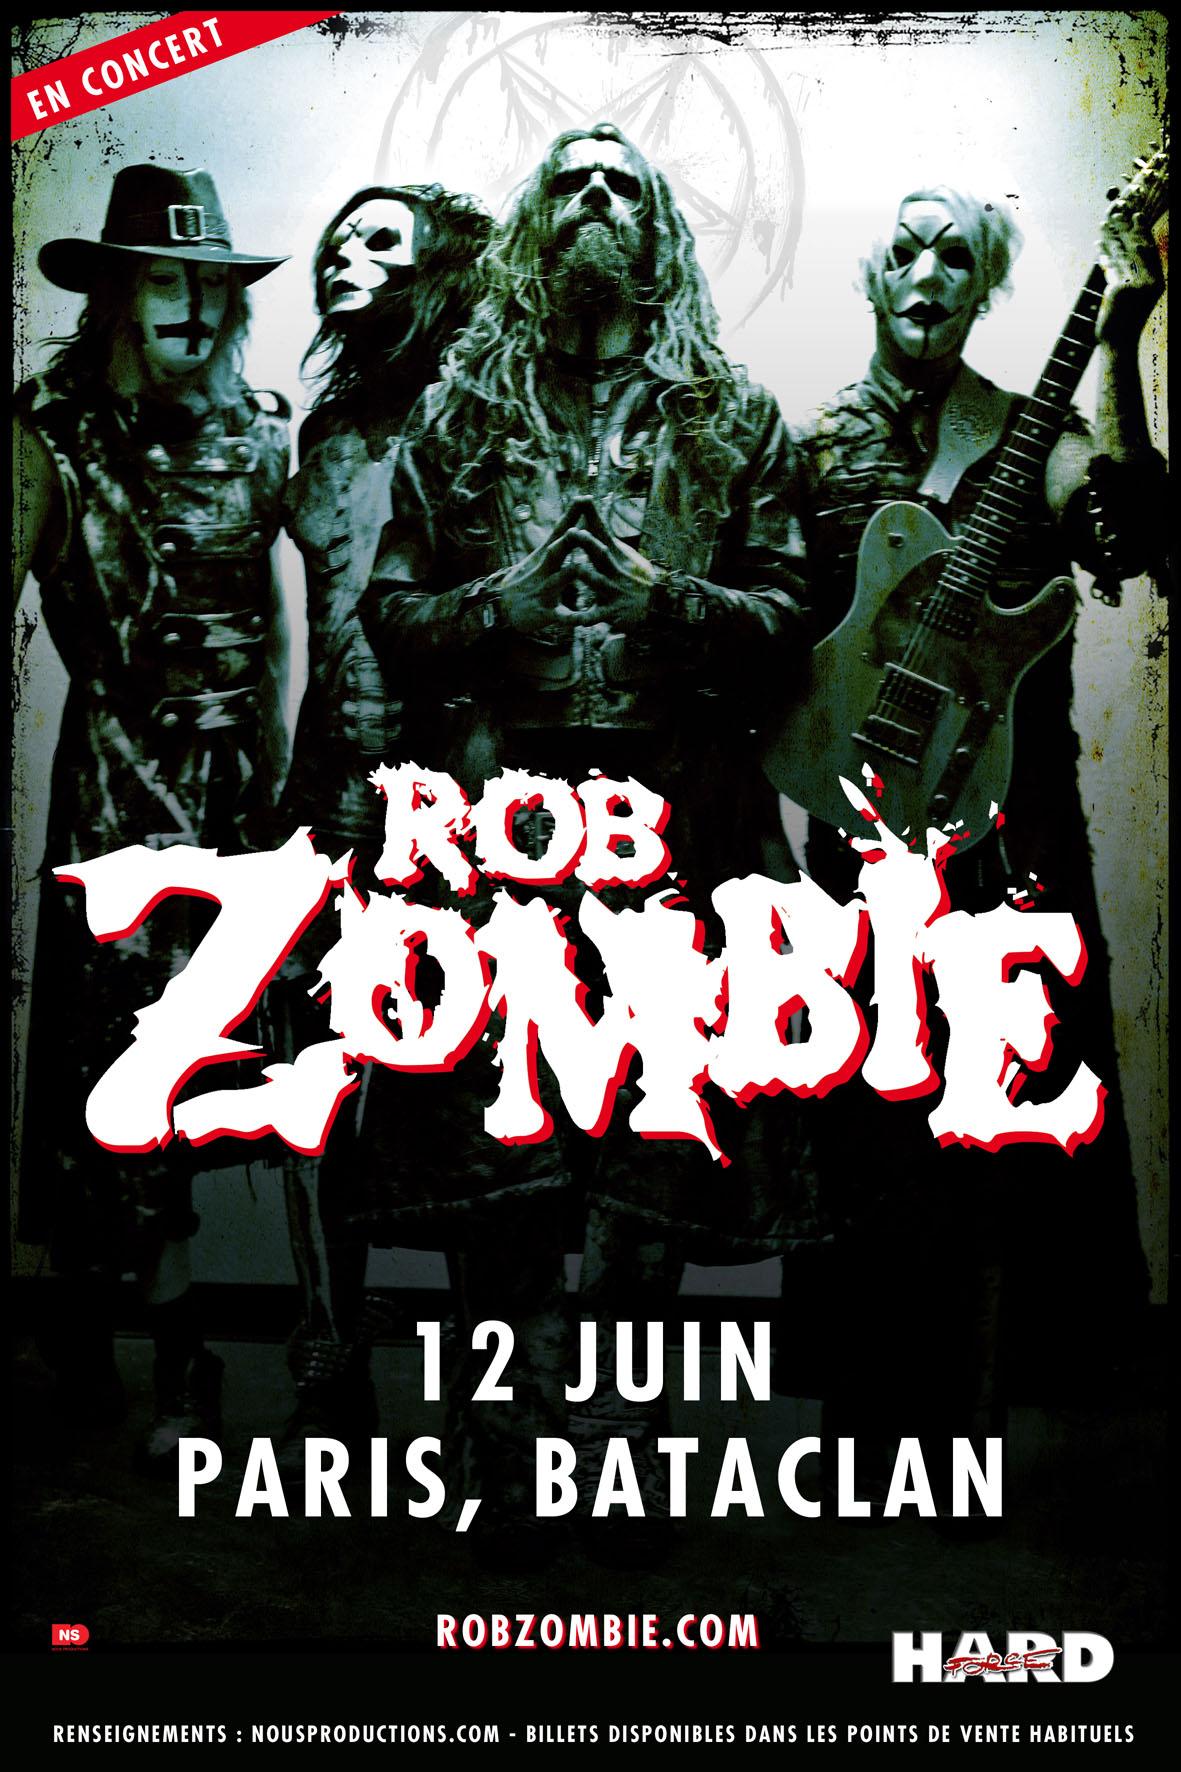 Rob Zombie + Powerman 5000 @ Bataclan (Paris), le 12 Juin 2014